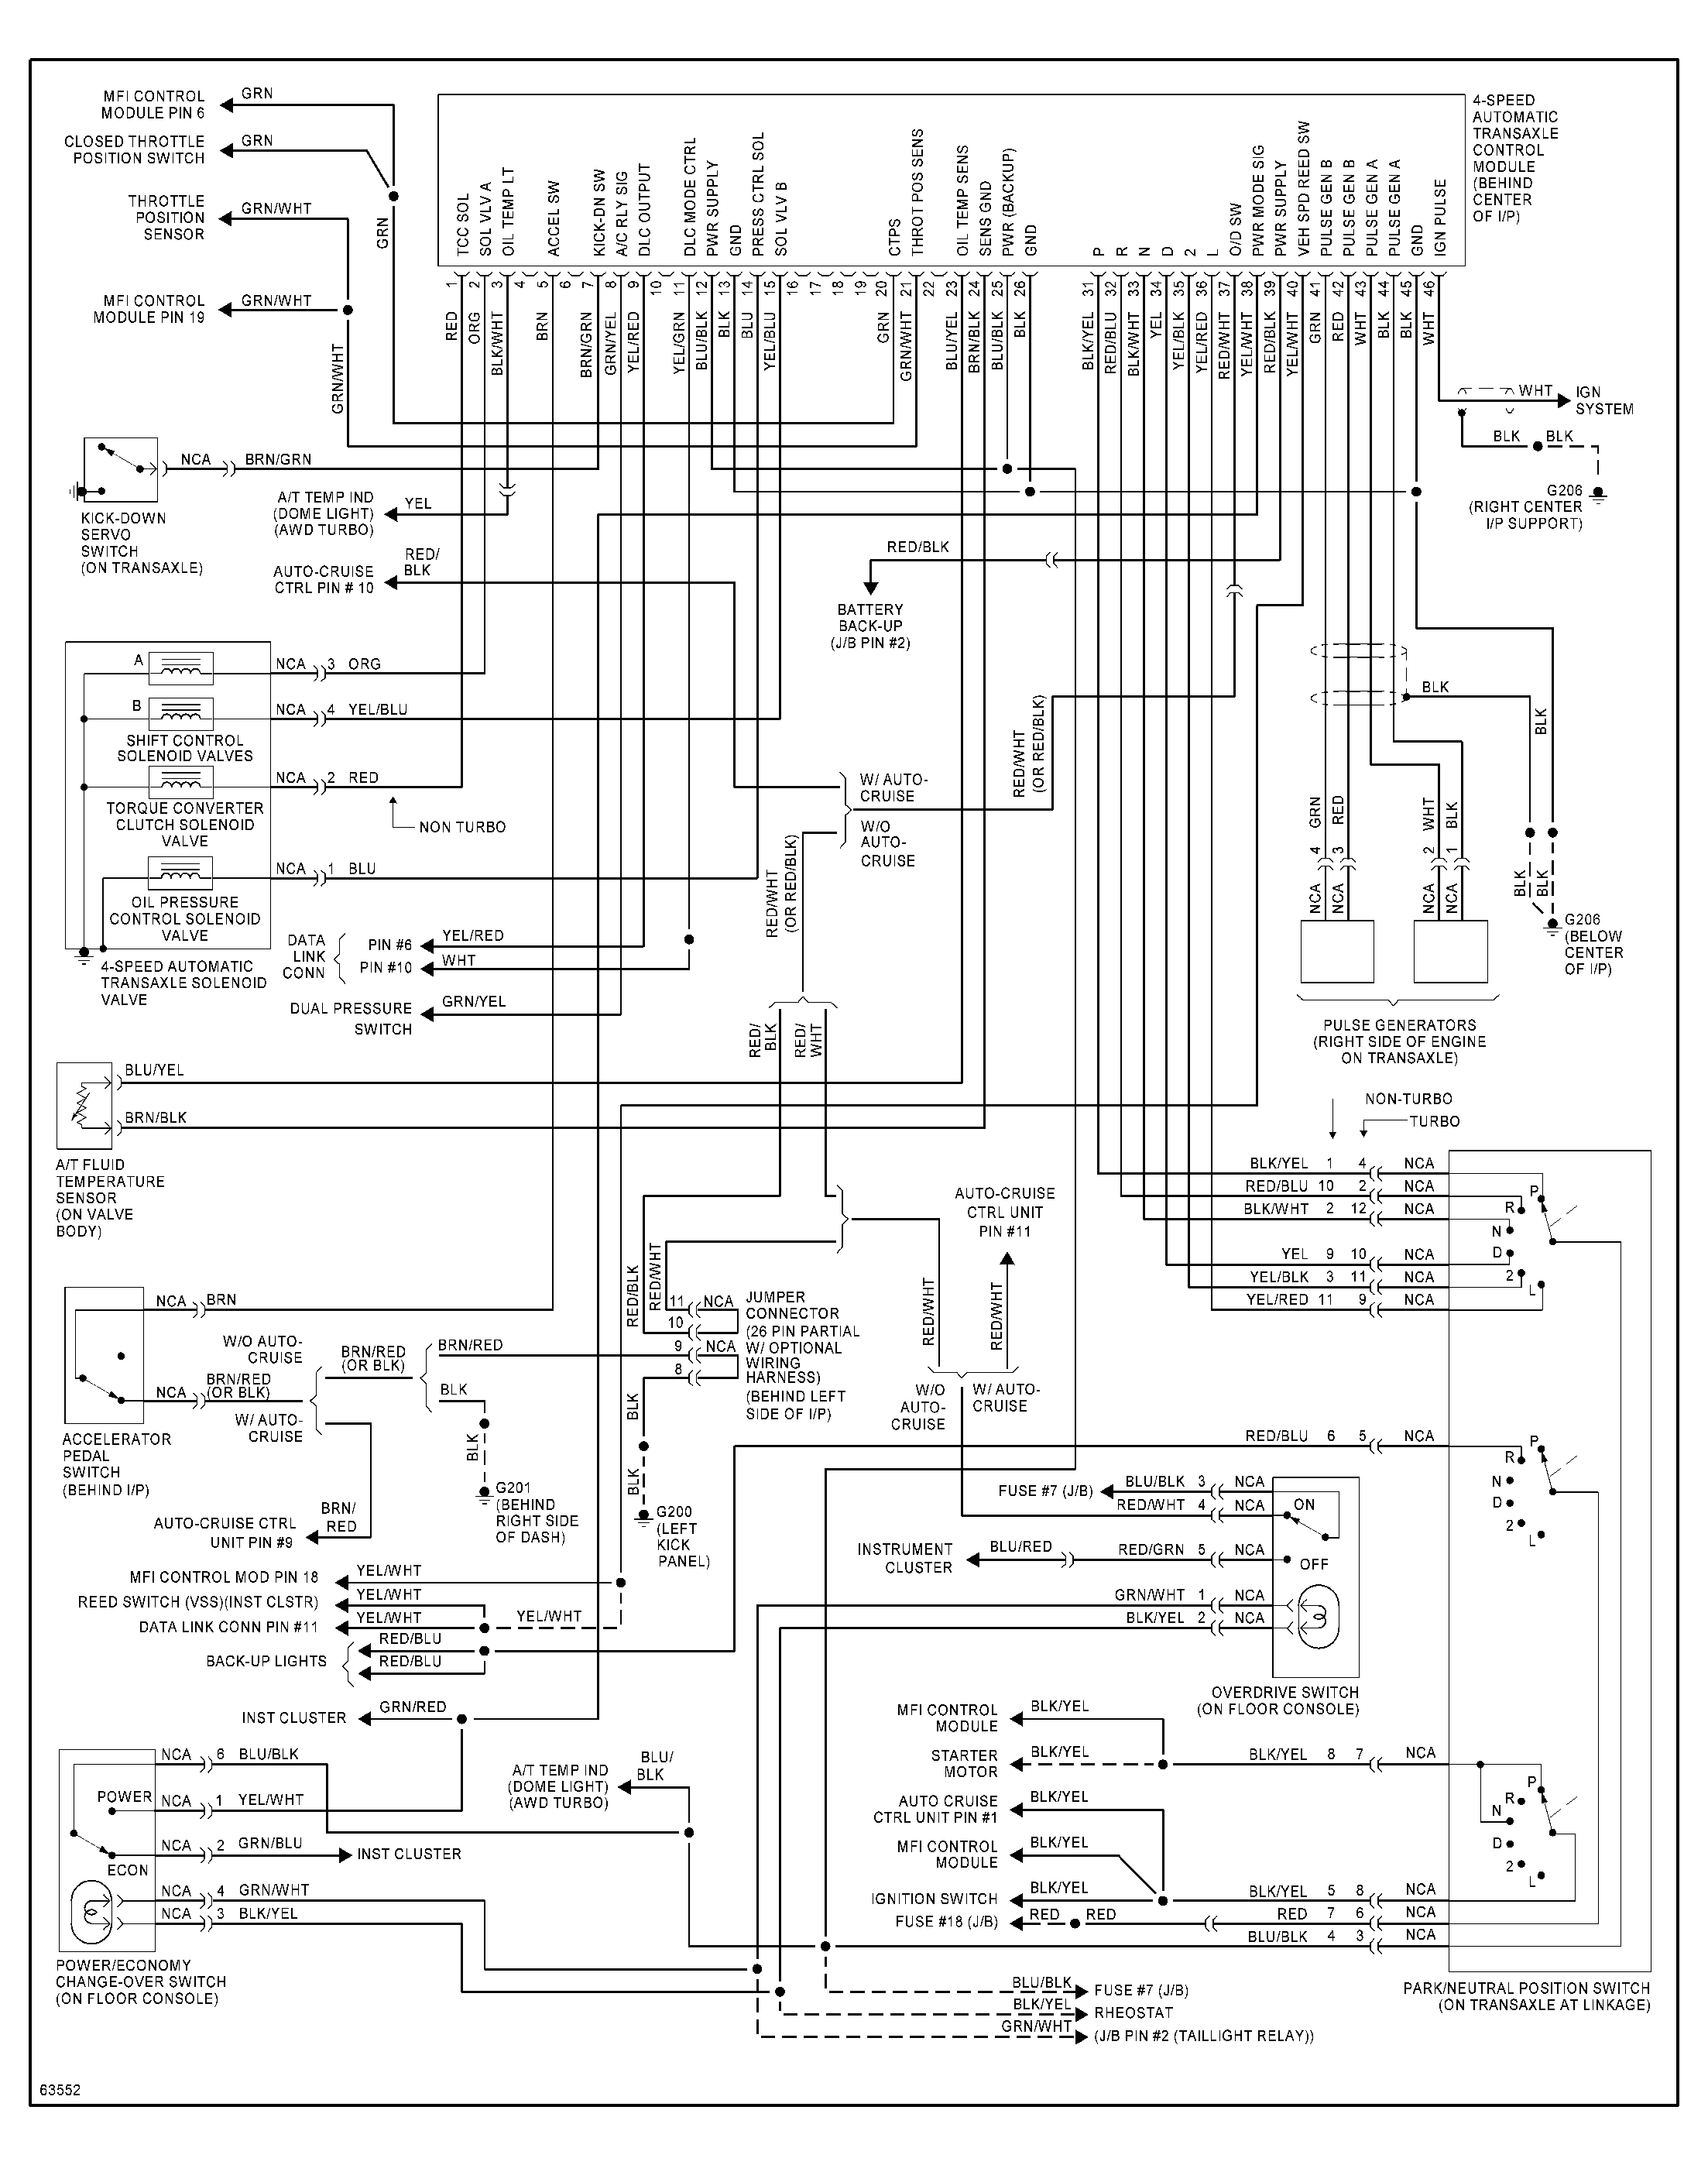 92 94 awd turbo auto transmission wiring diagram